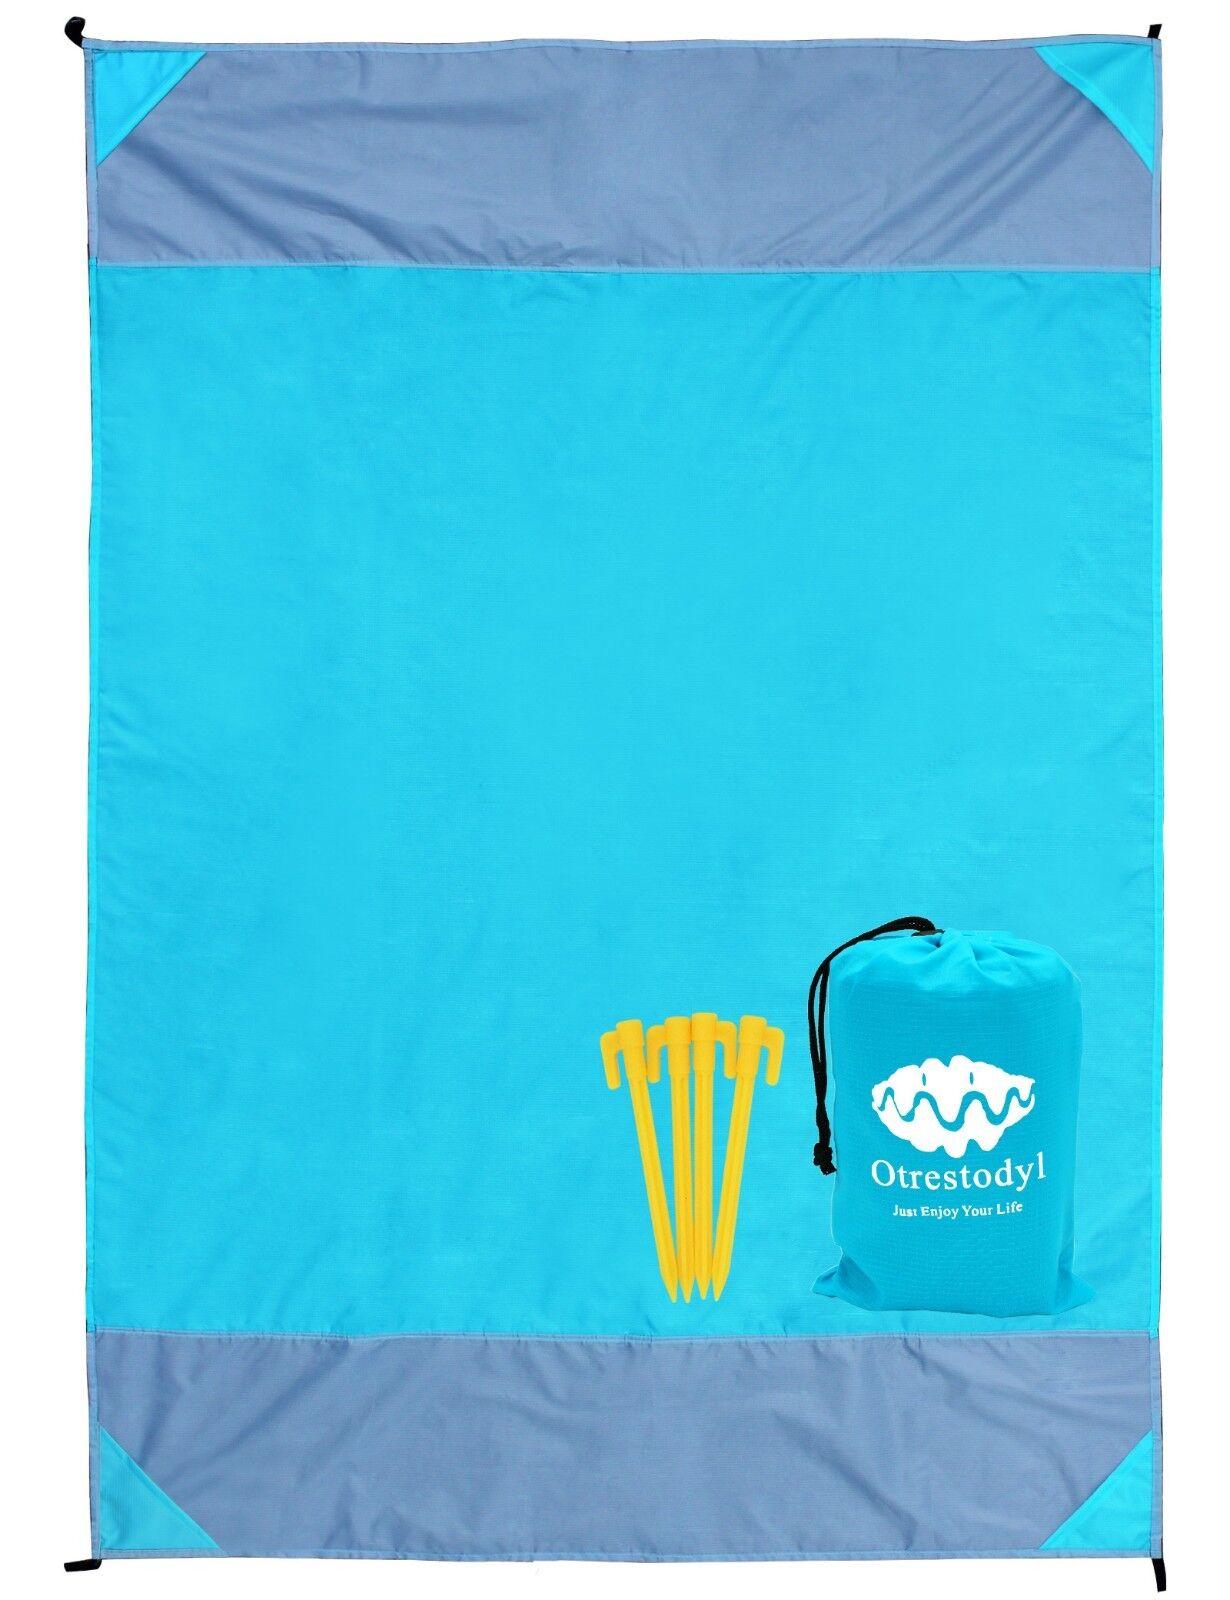 "Otrestodyl Sandproof Beach Blanket 79"" X 57"" Waterproof Picn"